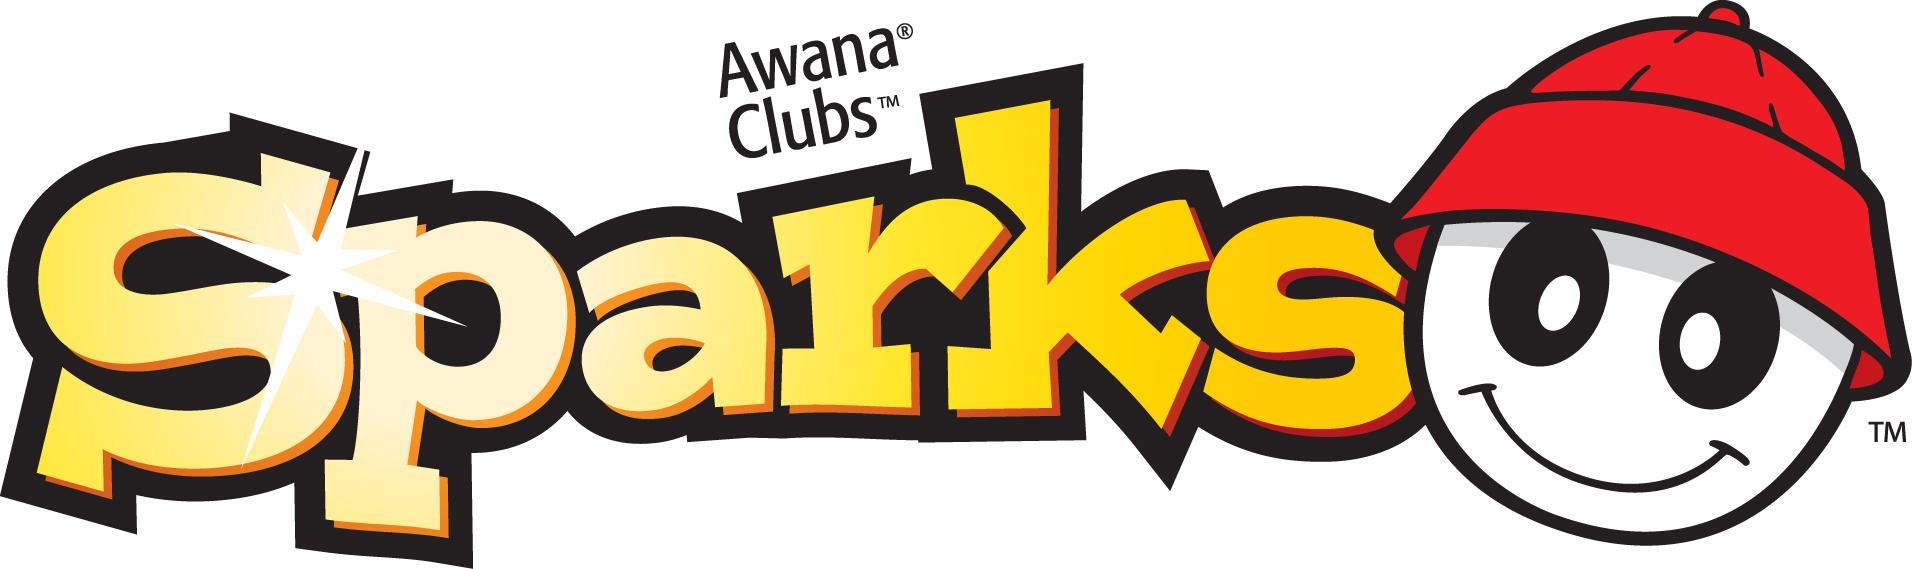 childrens-awana-sparks